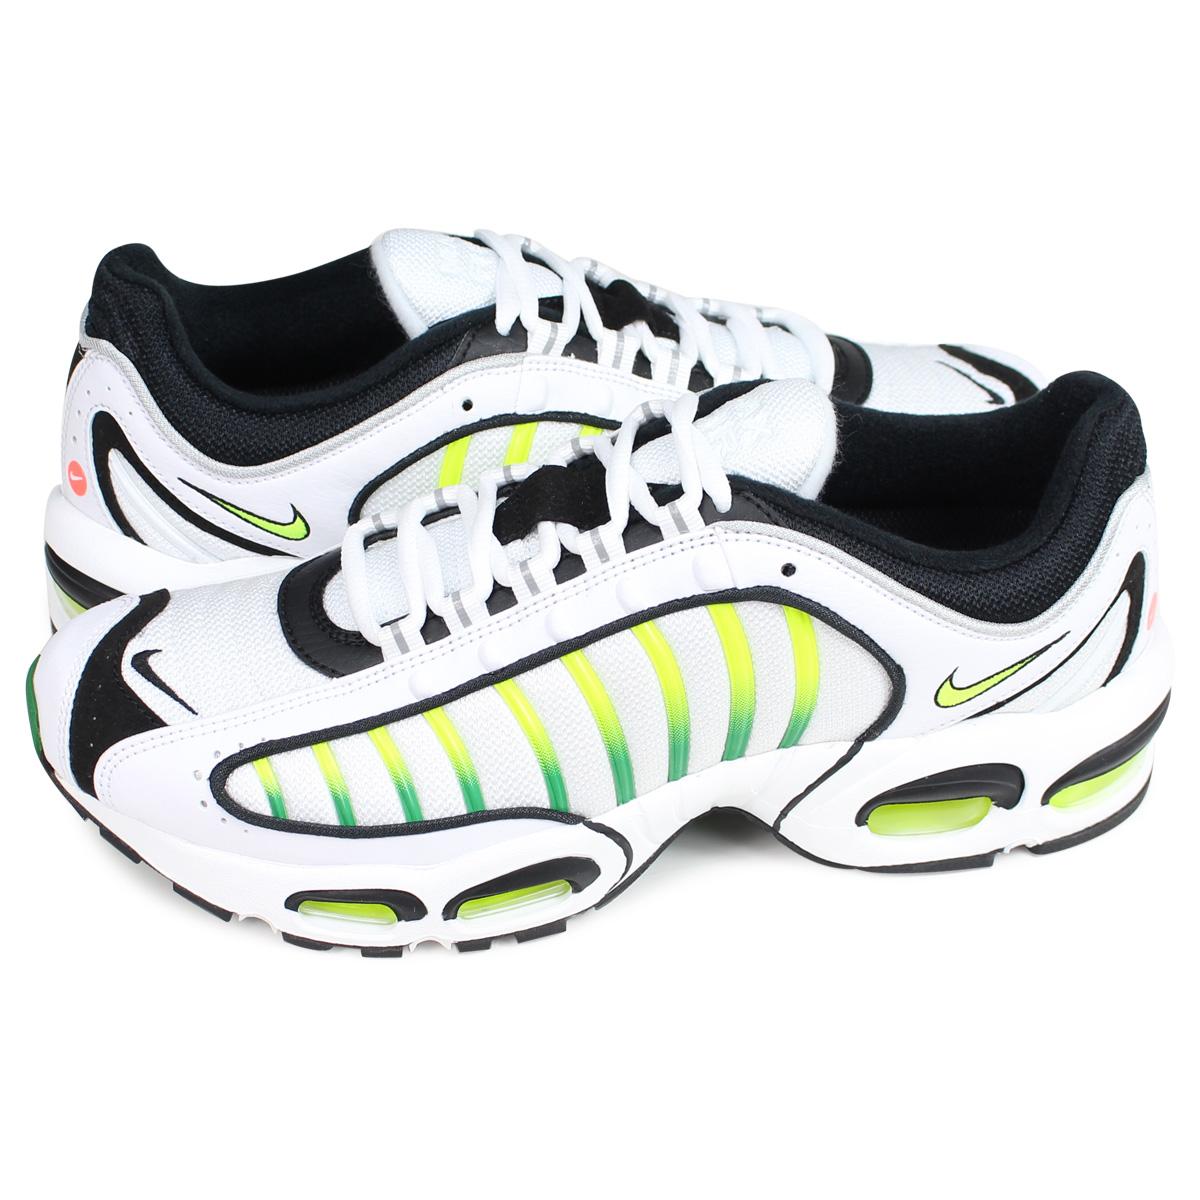 Nike NIKE Air Max tale wind 4 sneakers men AIR MAX TAILWIND 4 white white AQ2567 100 [195]